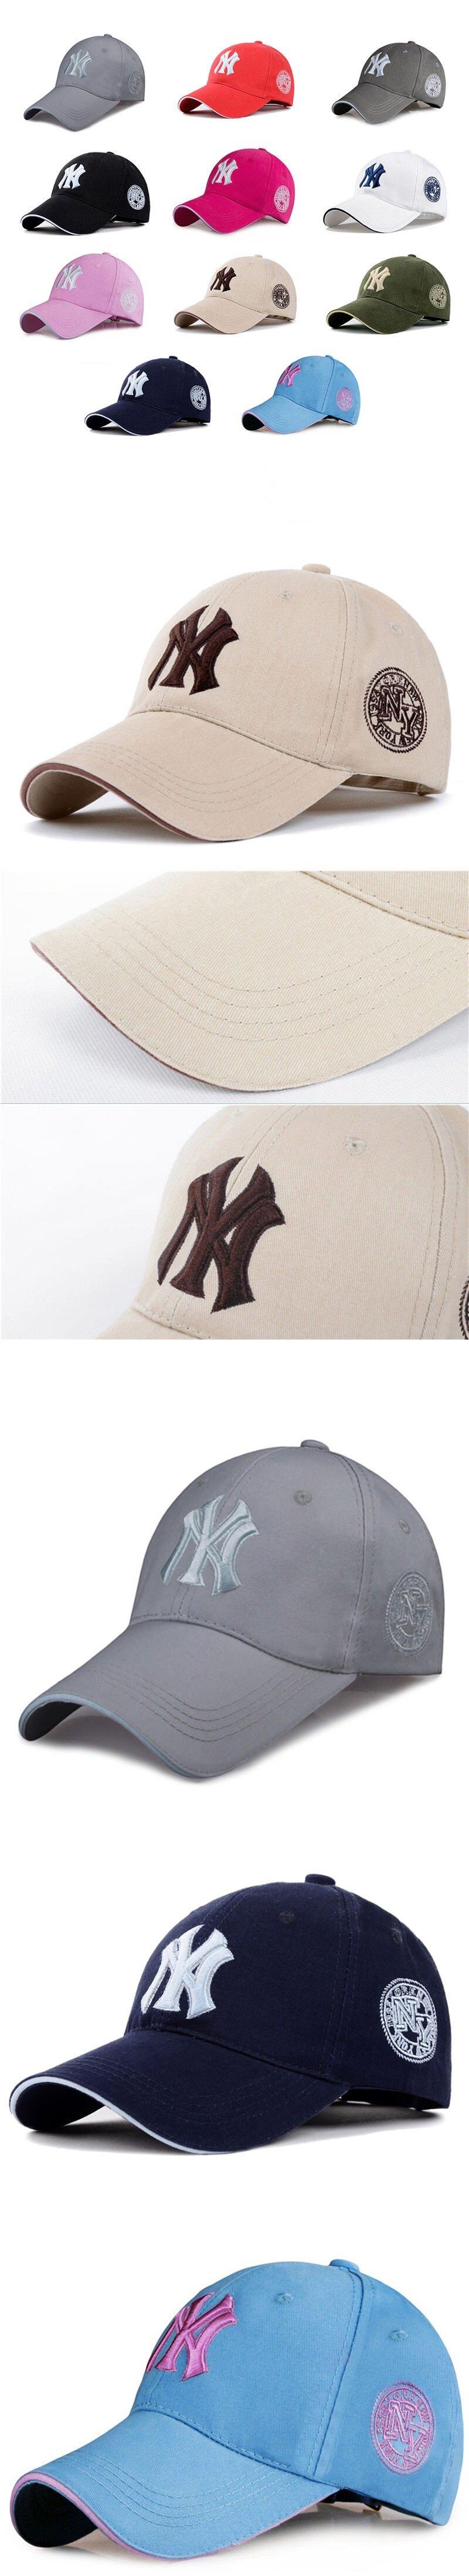 ... cheap new york yankees cap myntra quest yankees hip hop mlb snapback  baseball caps ny hats dc5a8dc73213